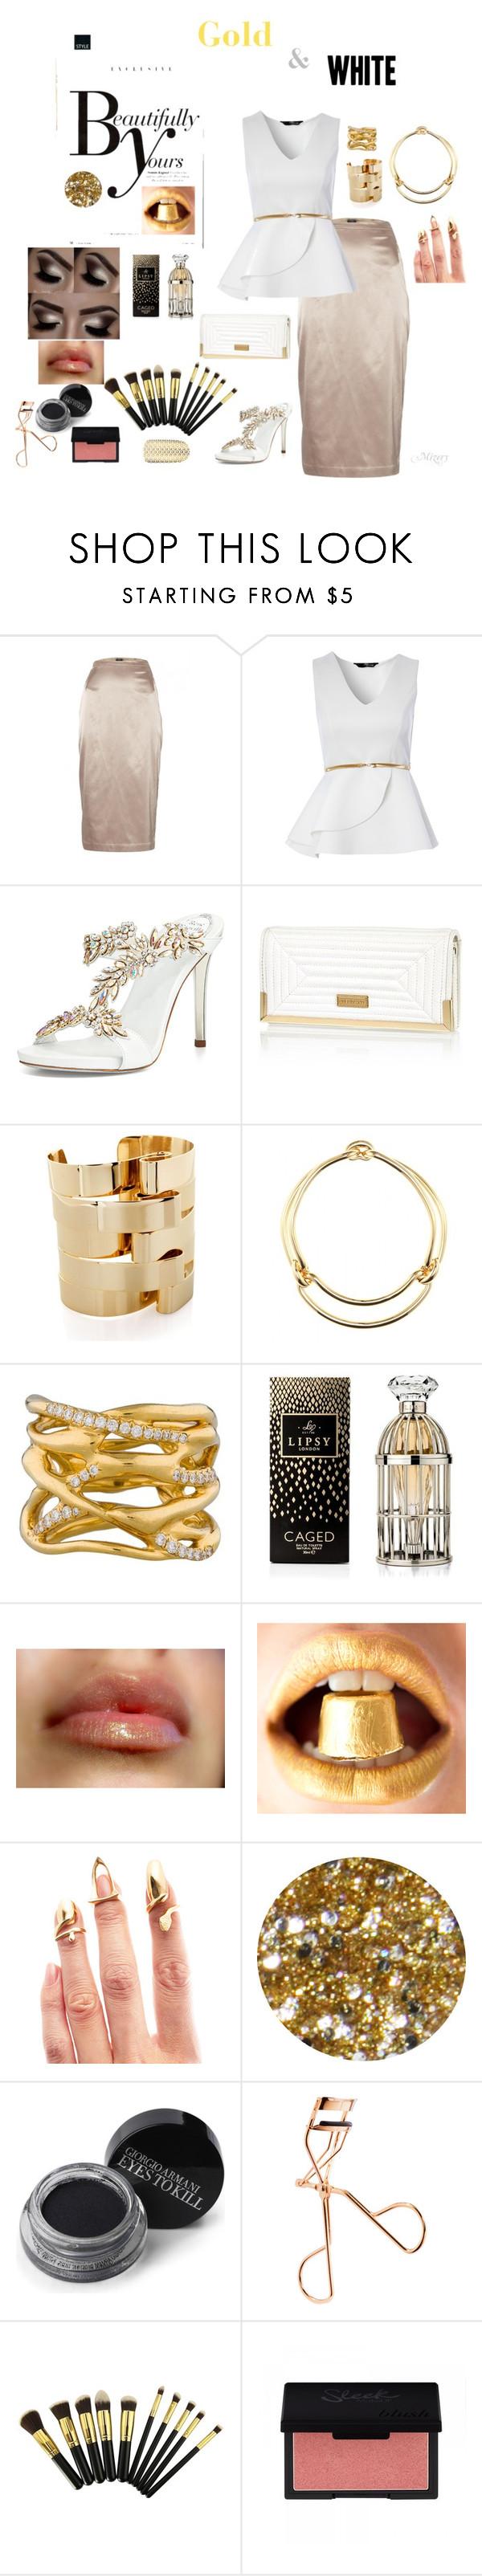 """Gold and white"" by mizery4u ❤ liked on Polyvore featuring Sonam Life, By Malene Birger, Jane Norman, René Caovilla, River Island, Oblik Atelier, Balenciaga, Ippolita, Lipsy and Bijules"